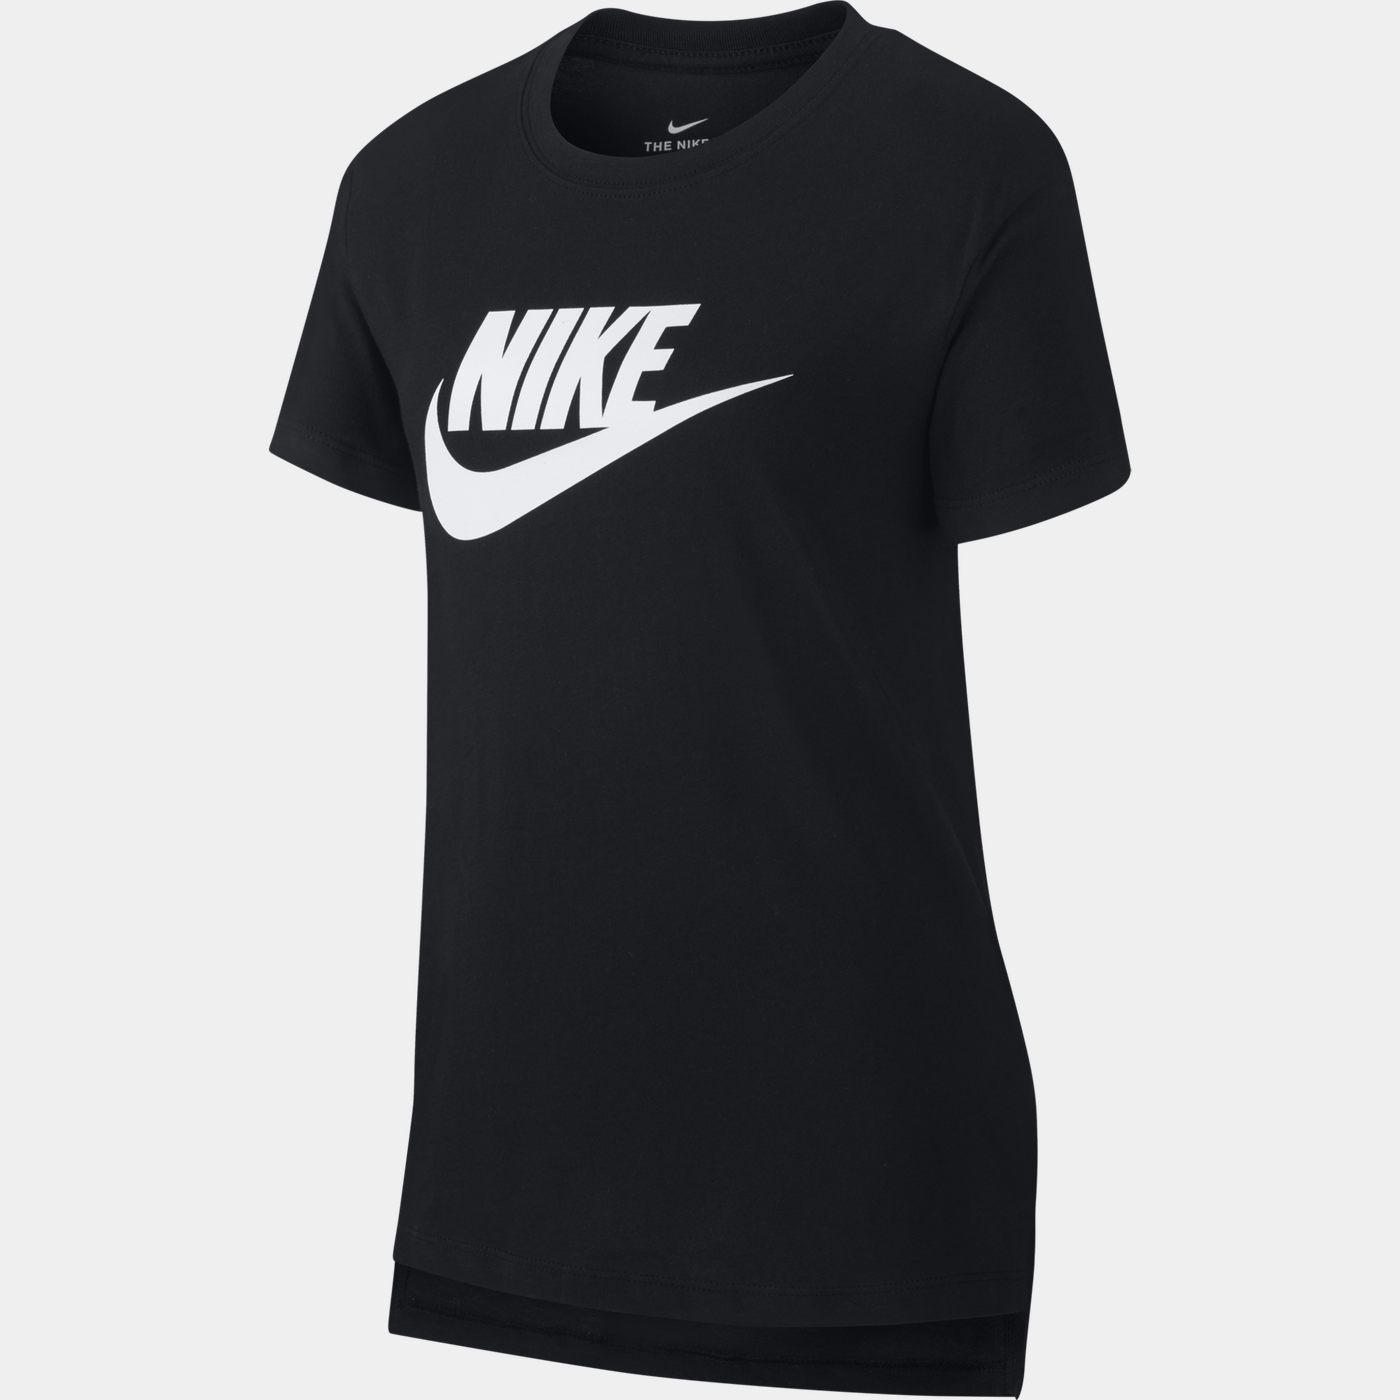 Nike Dptl Basic Futura, t-skjorte, junior, svart